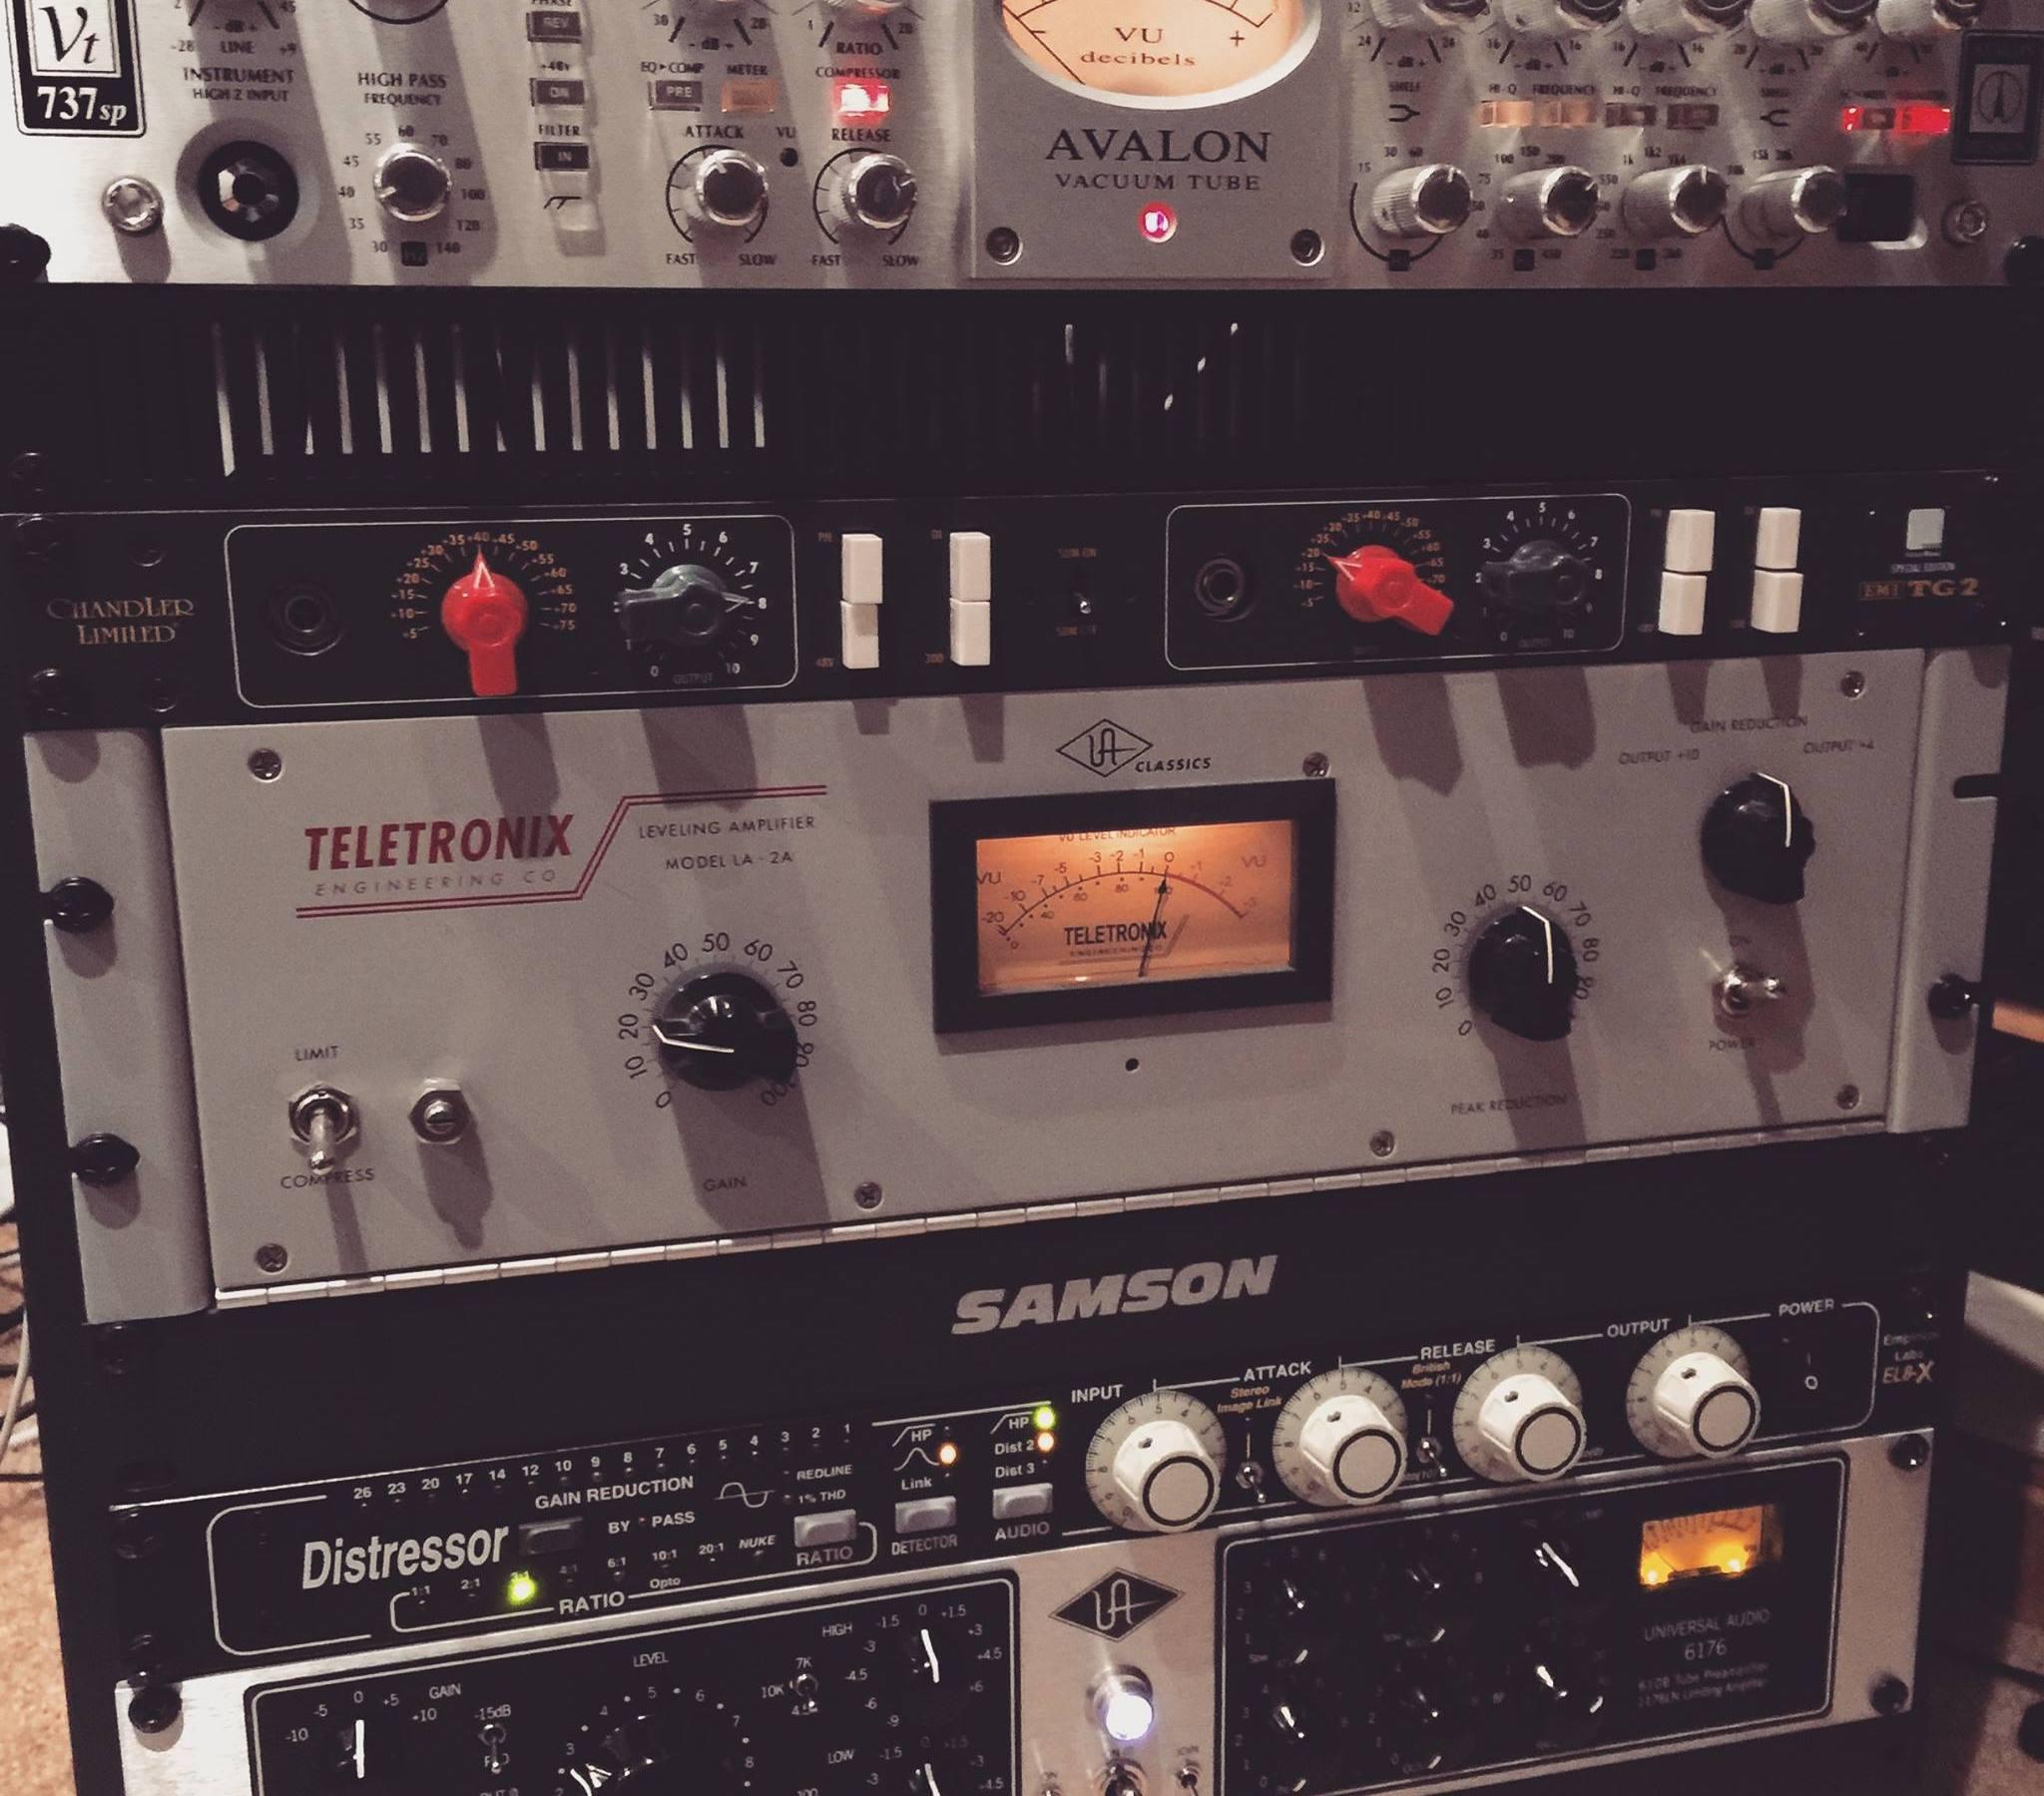 DMG Label - One99 Studios Rack